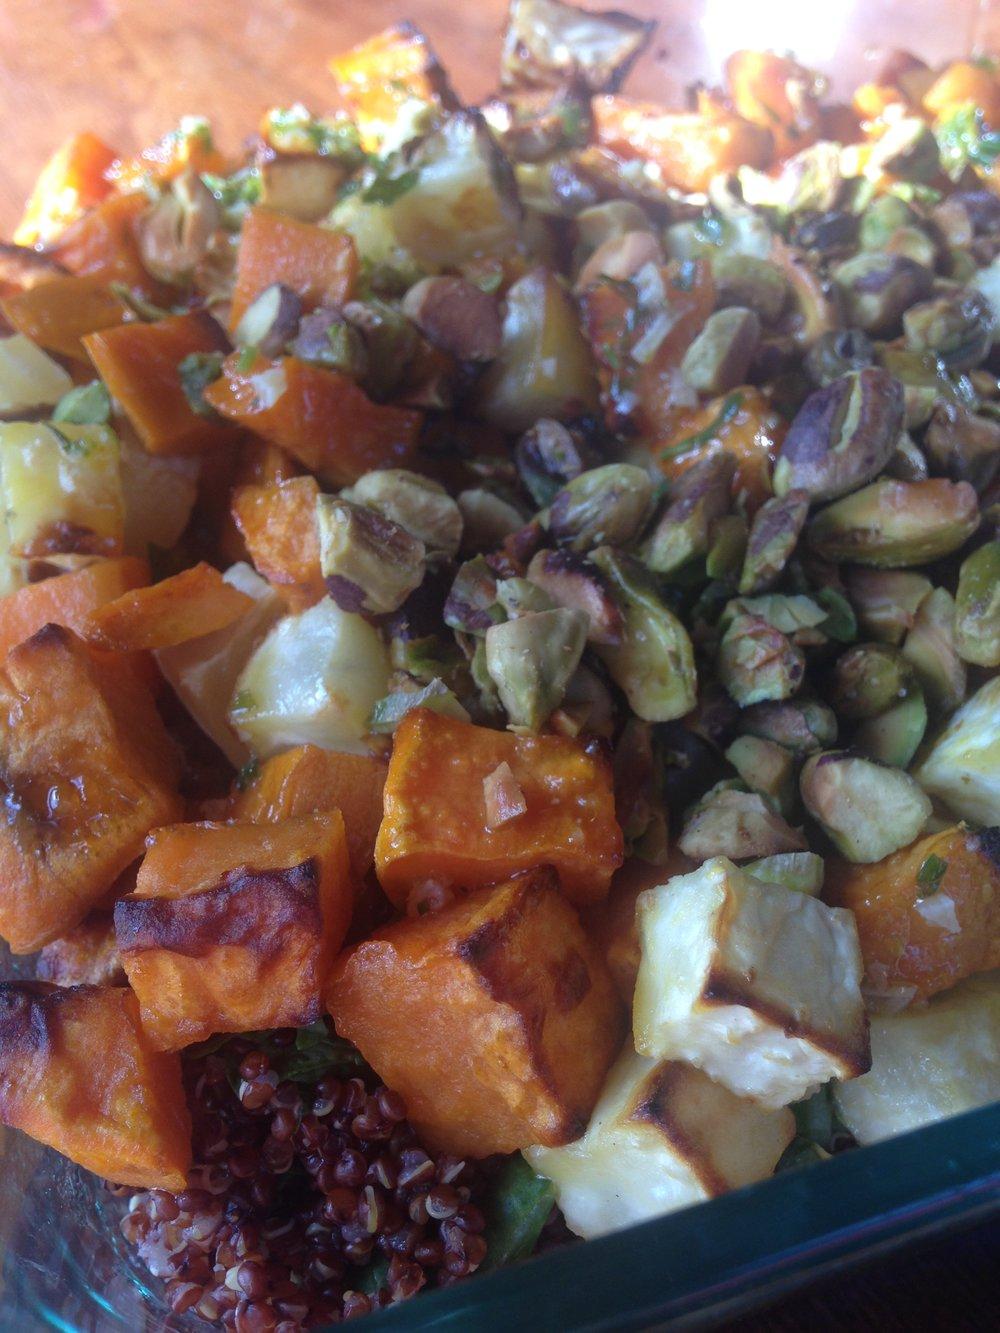 Sweet Potato%2c Celeriac%2c & Quinoa Bowl.JPG